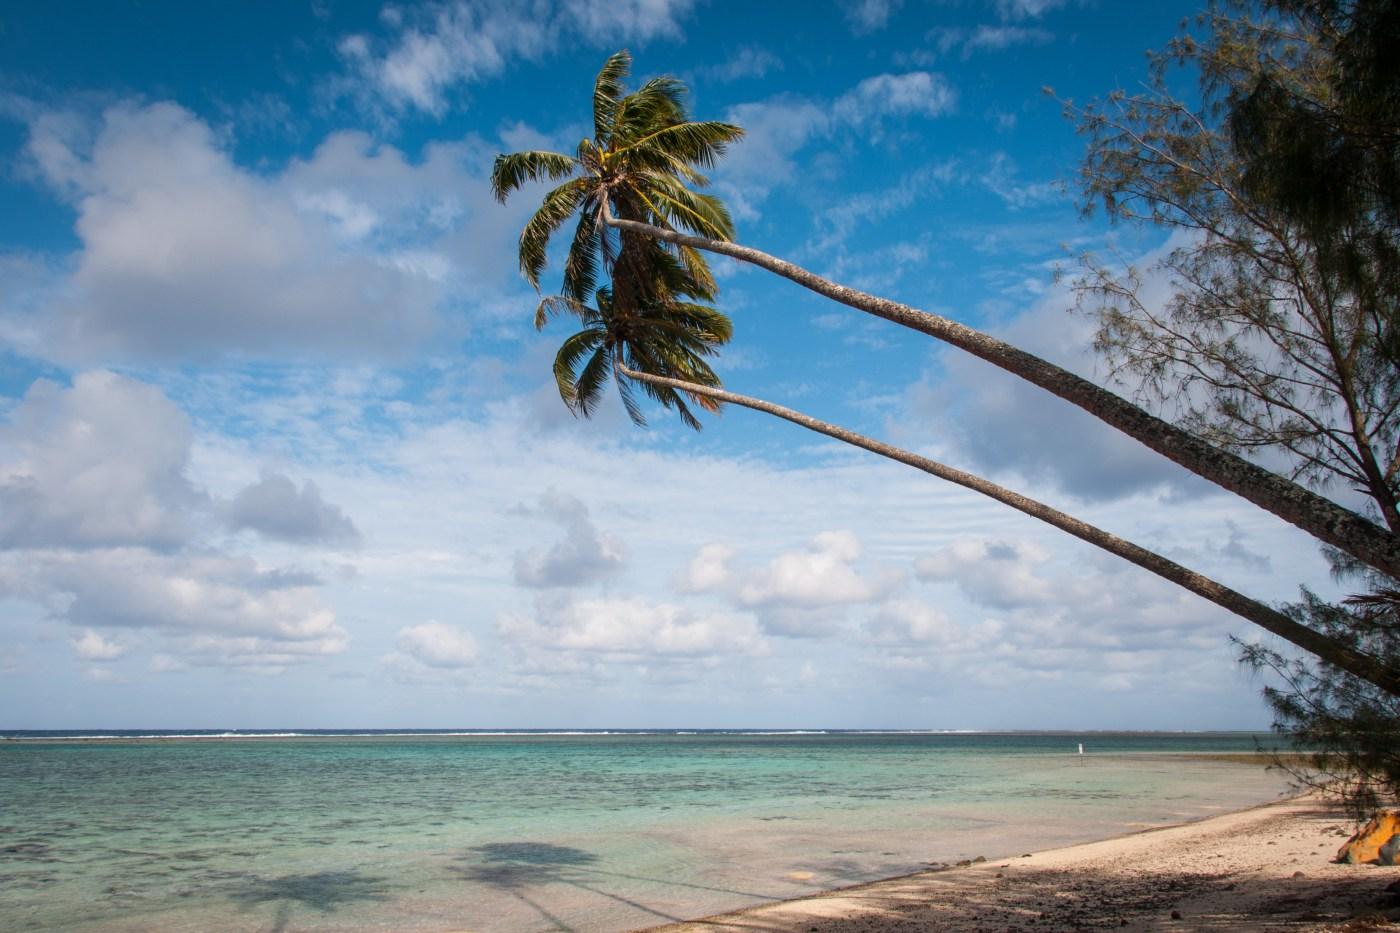 Palms at Vaimaanga Beach